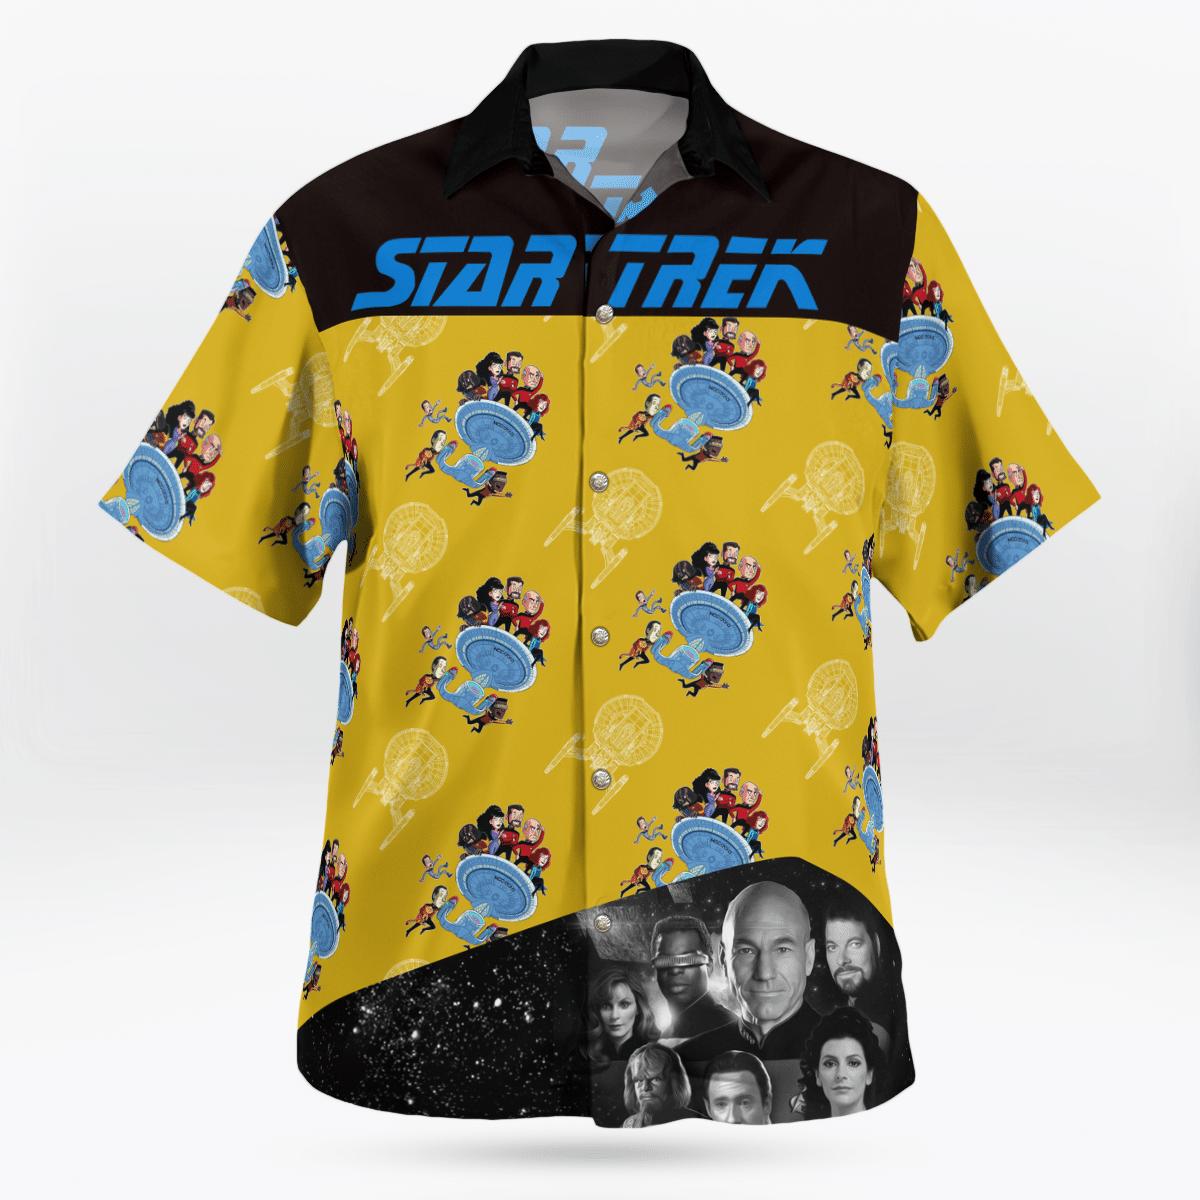 Star Trek operation hawaiian shirt - LIMITED EDITION